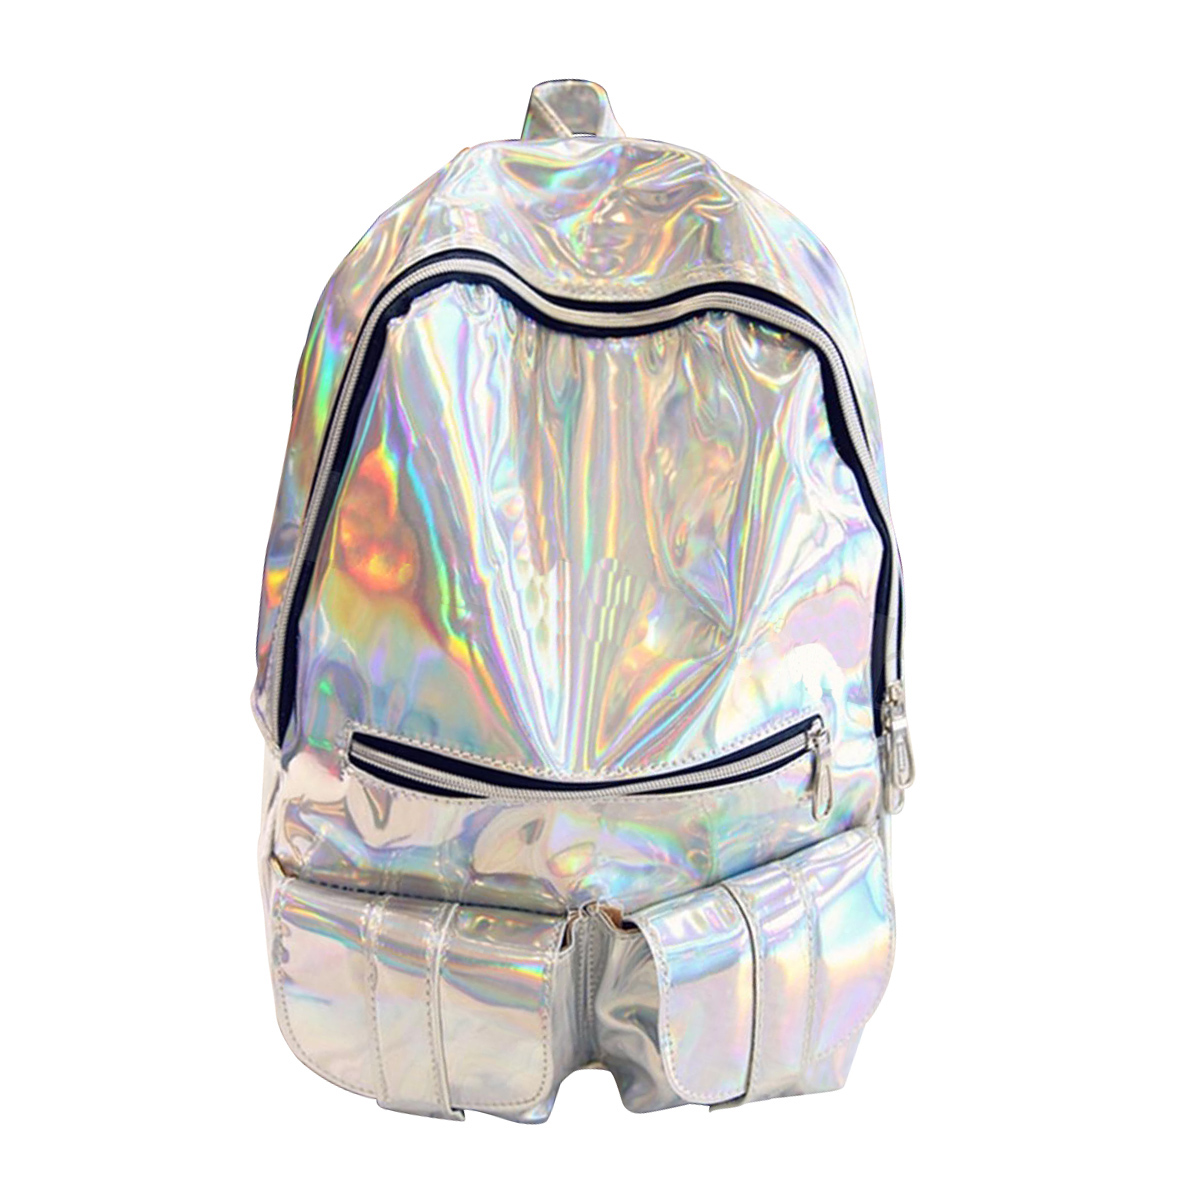 TFTP HOLOGRAPHIC Gammaray Hologram backpack Women Backpack men's Bag leather Holographic Backpack